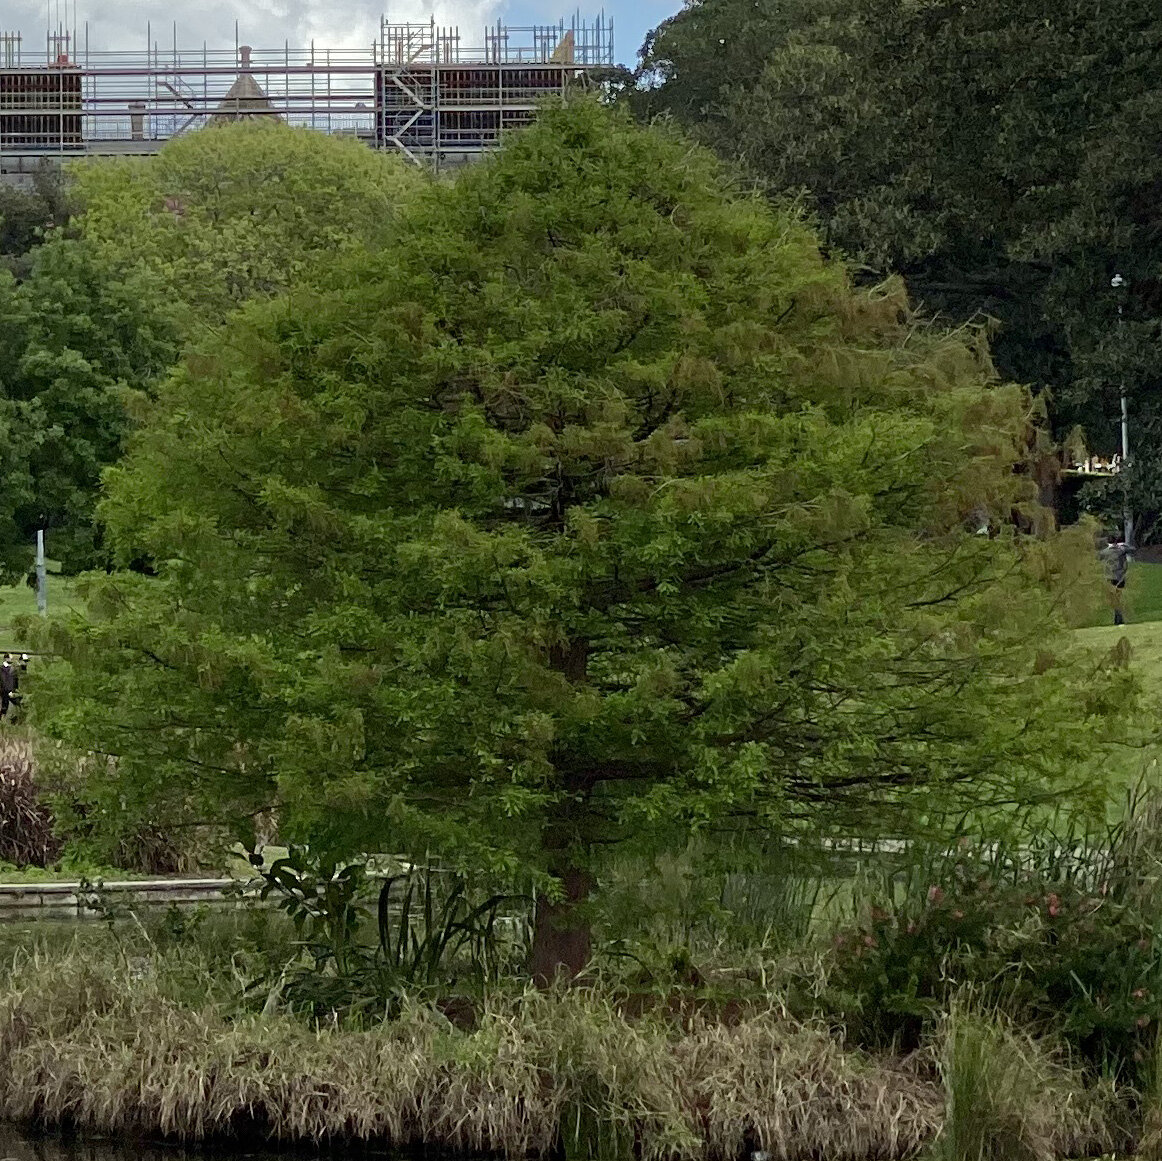 Lake Northam, Victoria Park, Sydney (iPhone 11 Pro - 2x zoom lens) - 100% crop